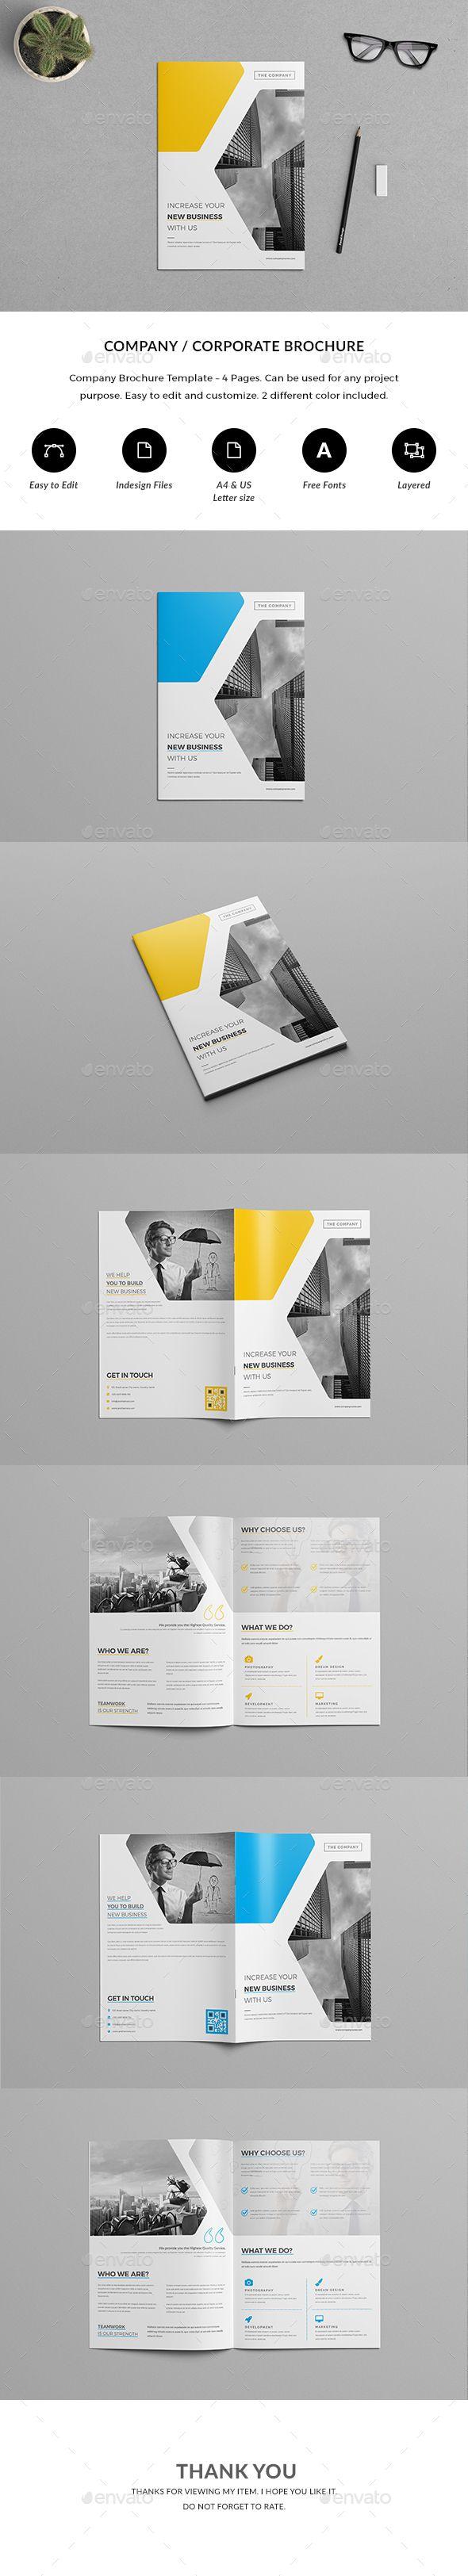 Page Brochure Brochure Template Design Pinterest Brochures - 4 page brochure template